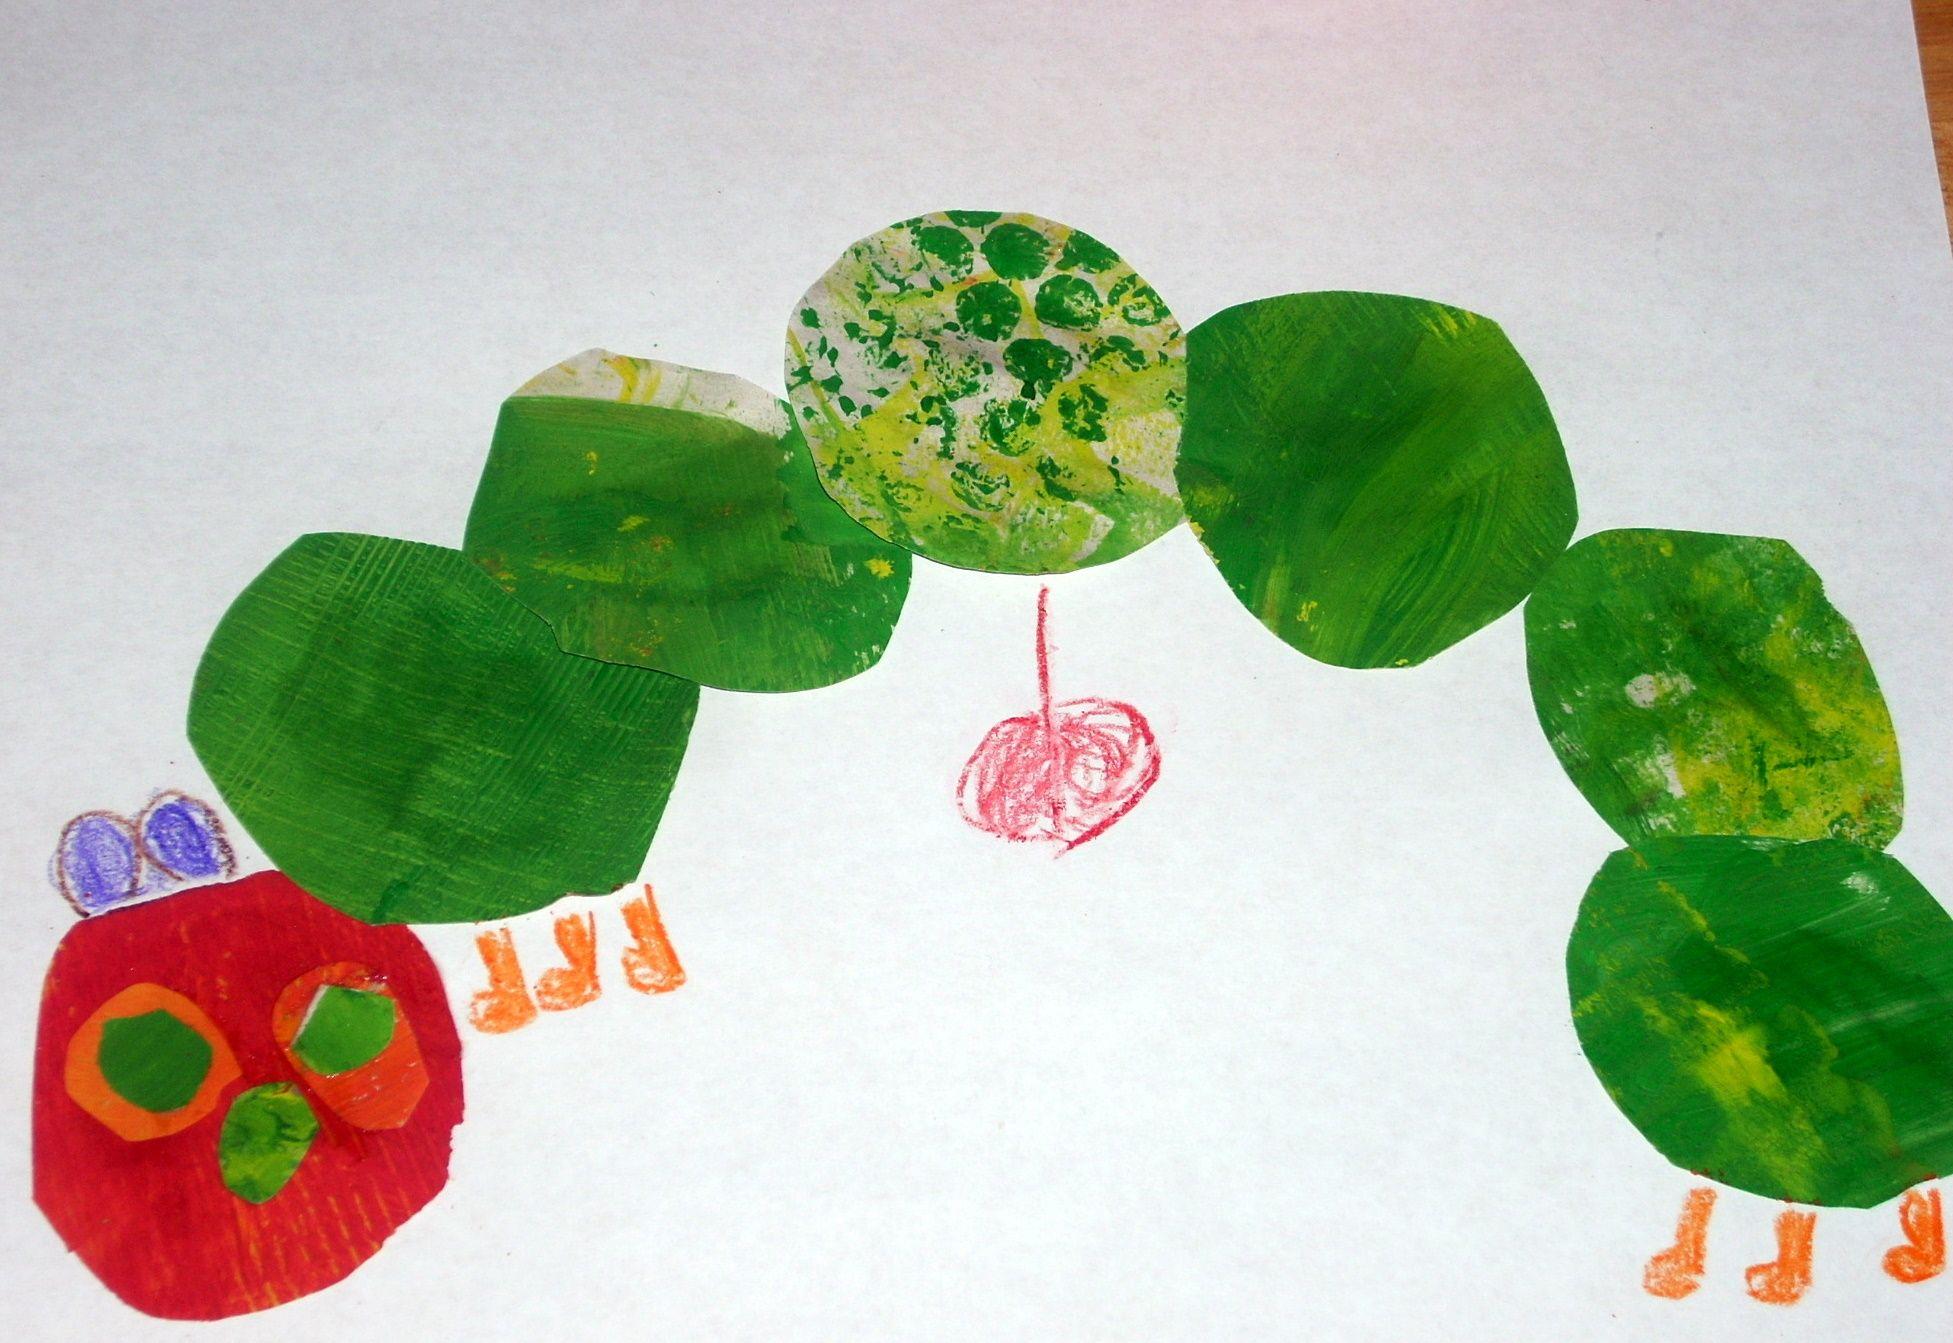 Diy Caterpillar Using Eric Carle S Techniques Paint Texture Cutouts